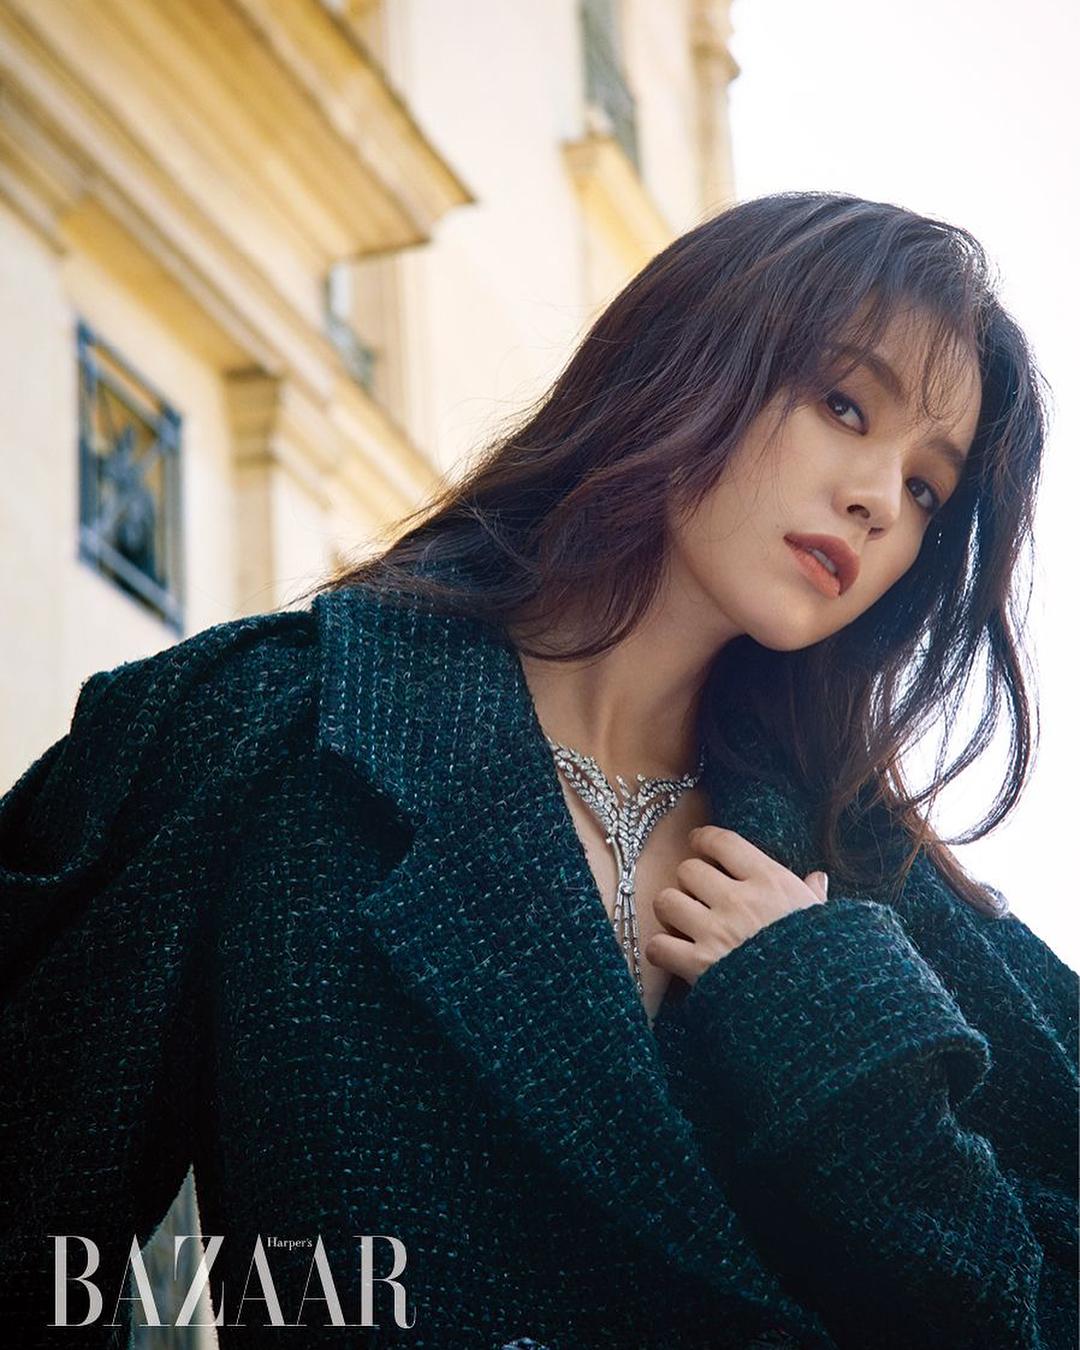 hanhyojoo222 / Han Hyo Joo via  instagram